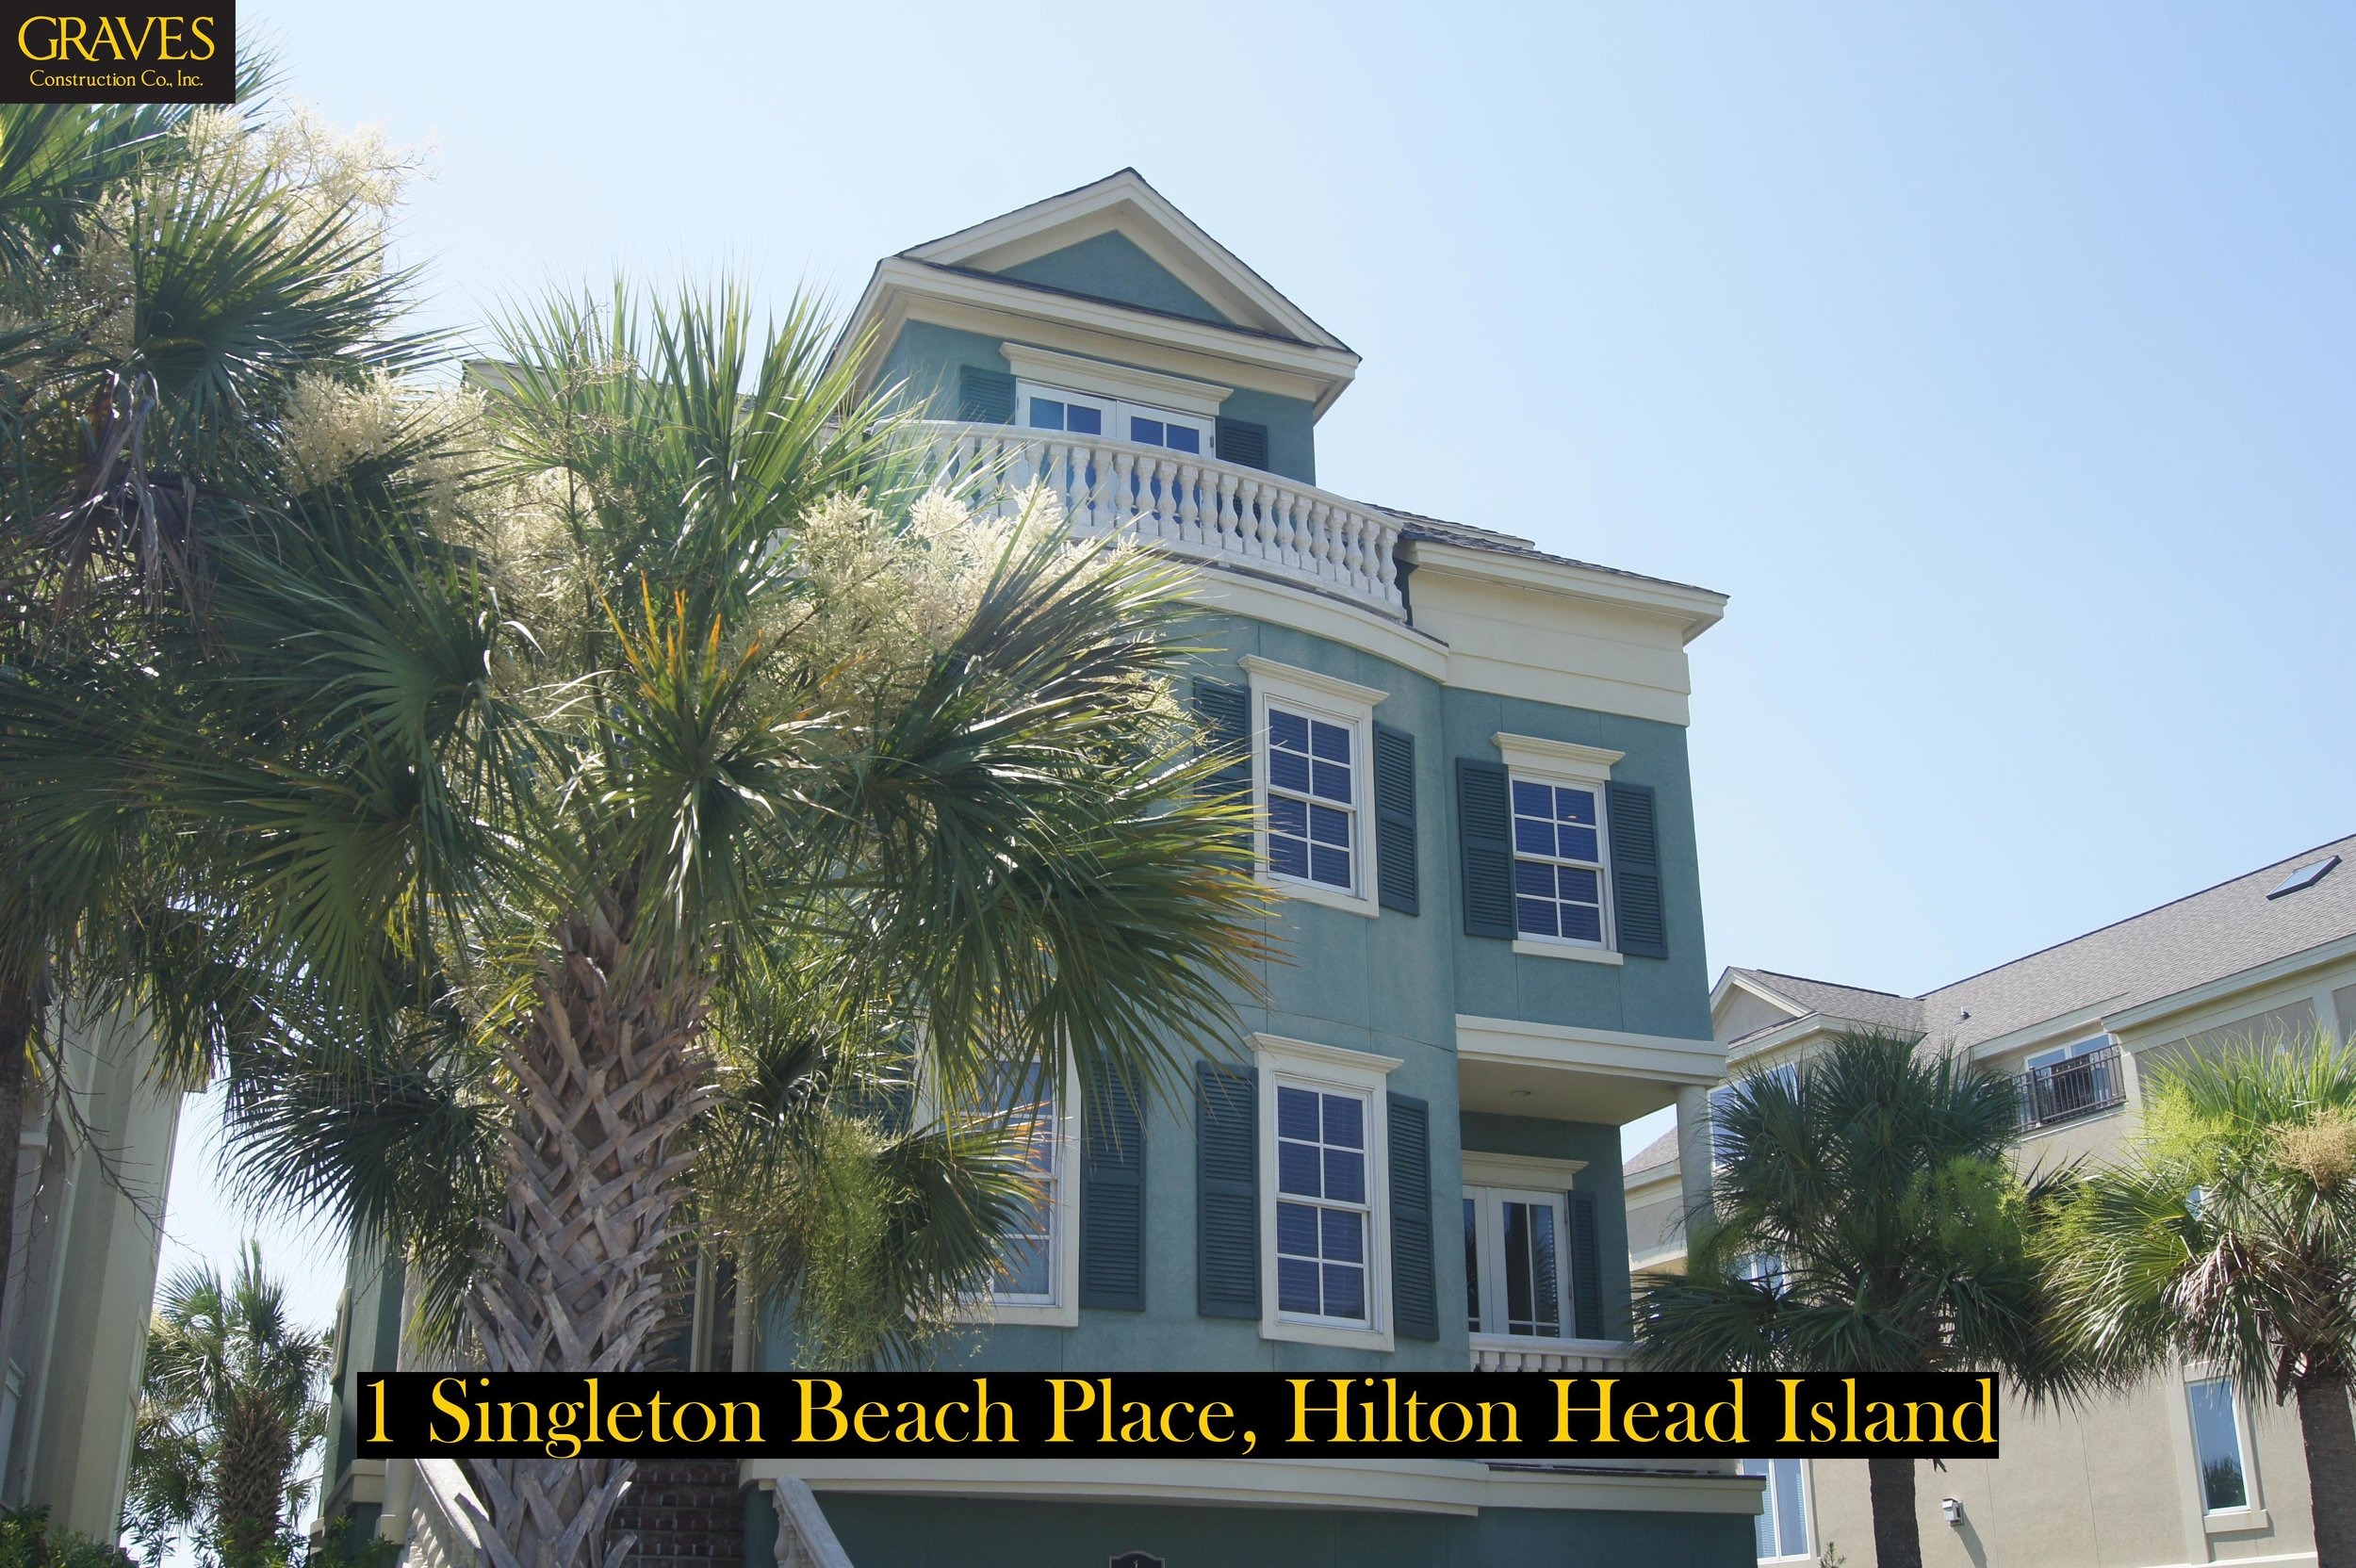 1 Singleton Beach Pl - 7